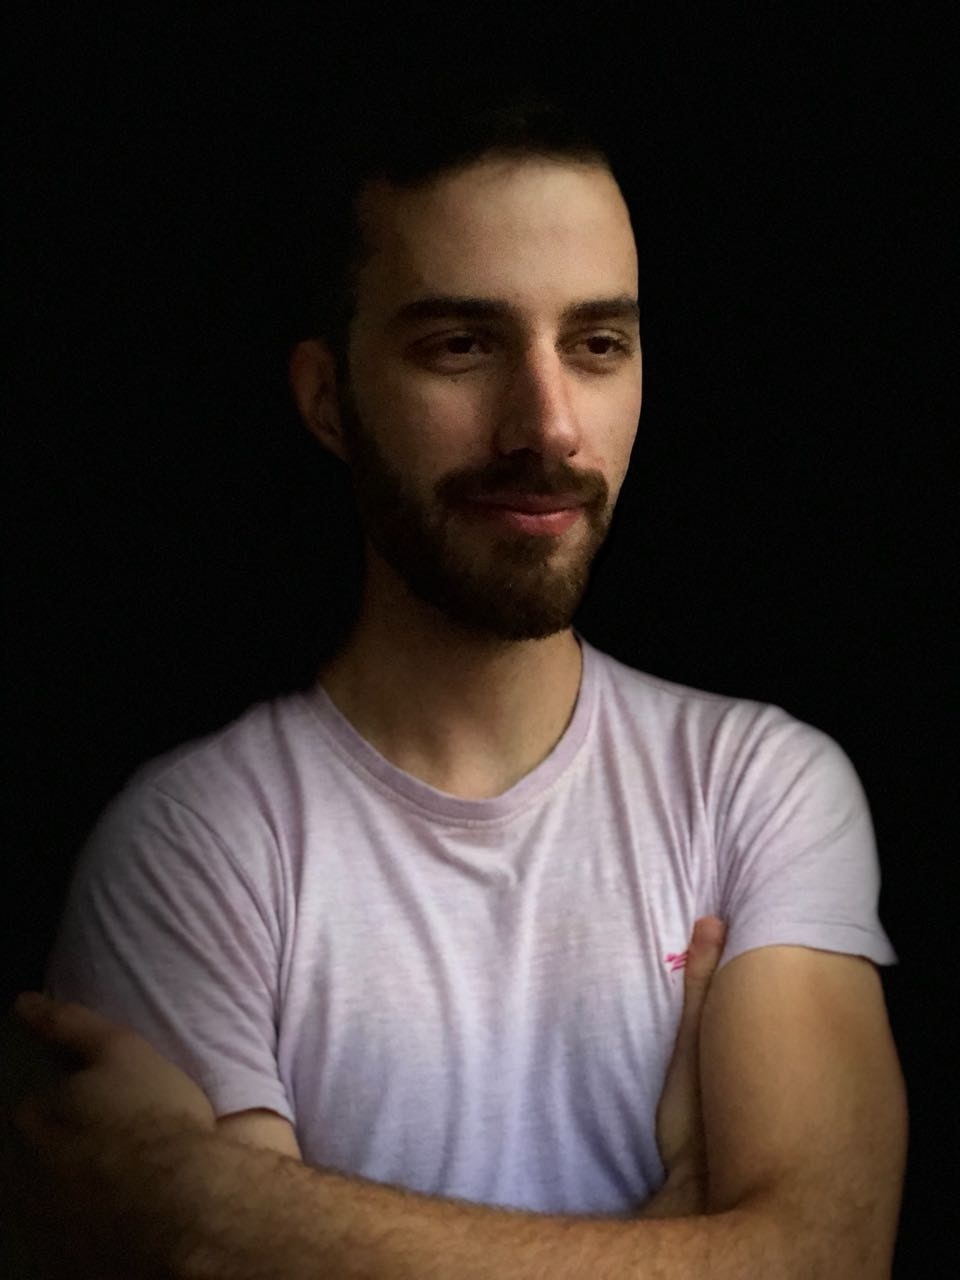 Go to Leonardo Felipe Blauth Dorl's profile